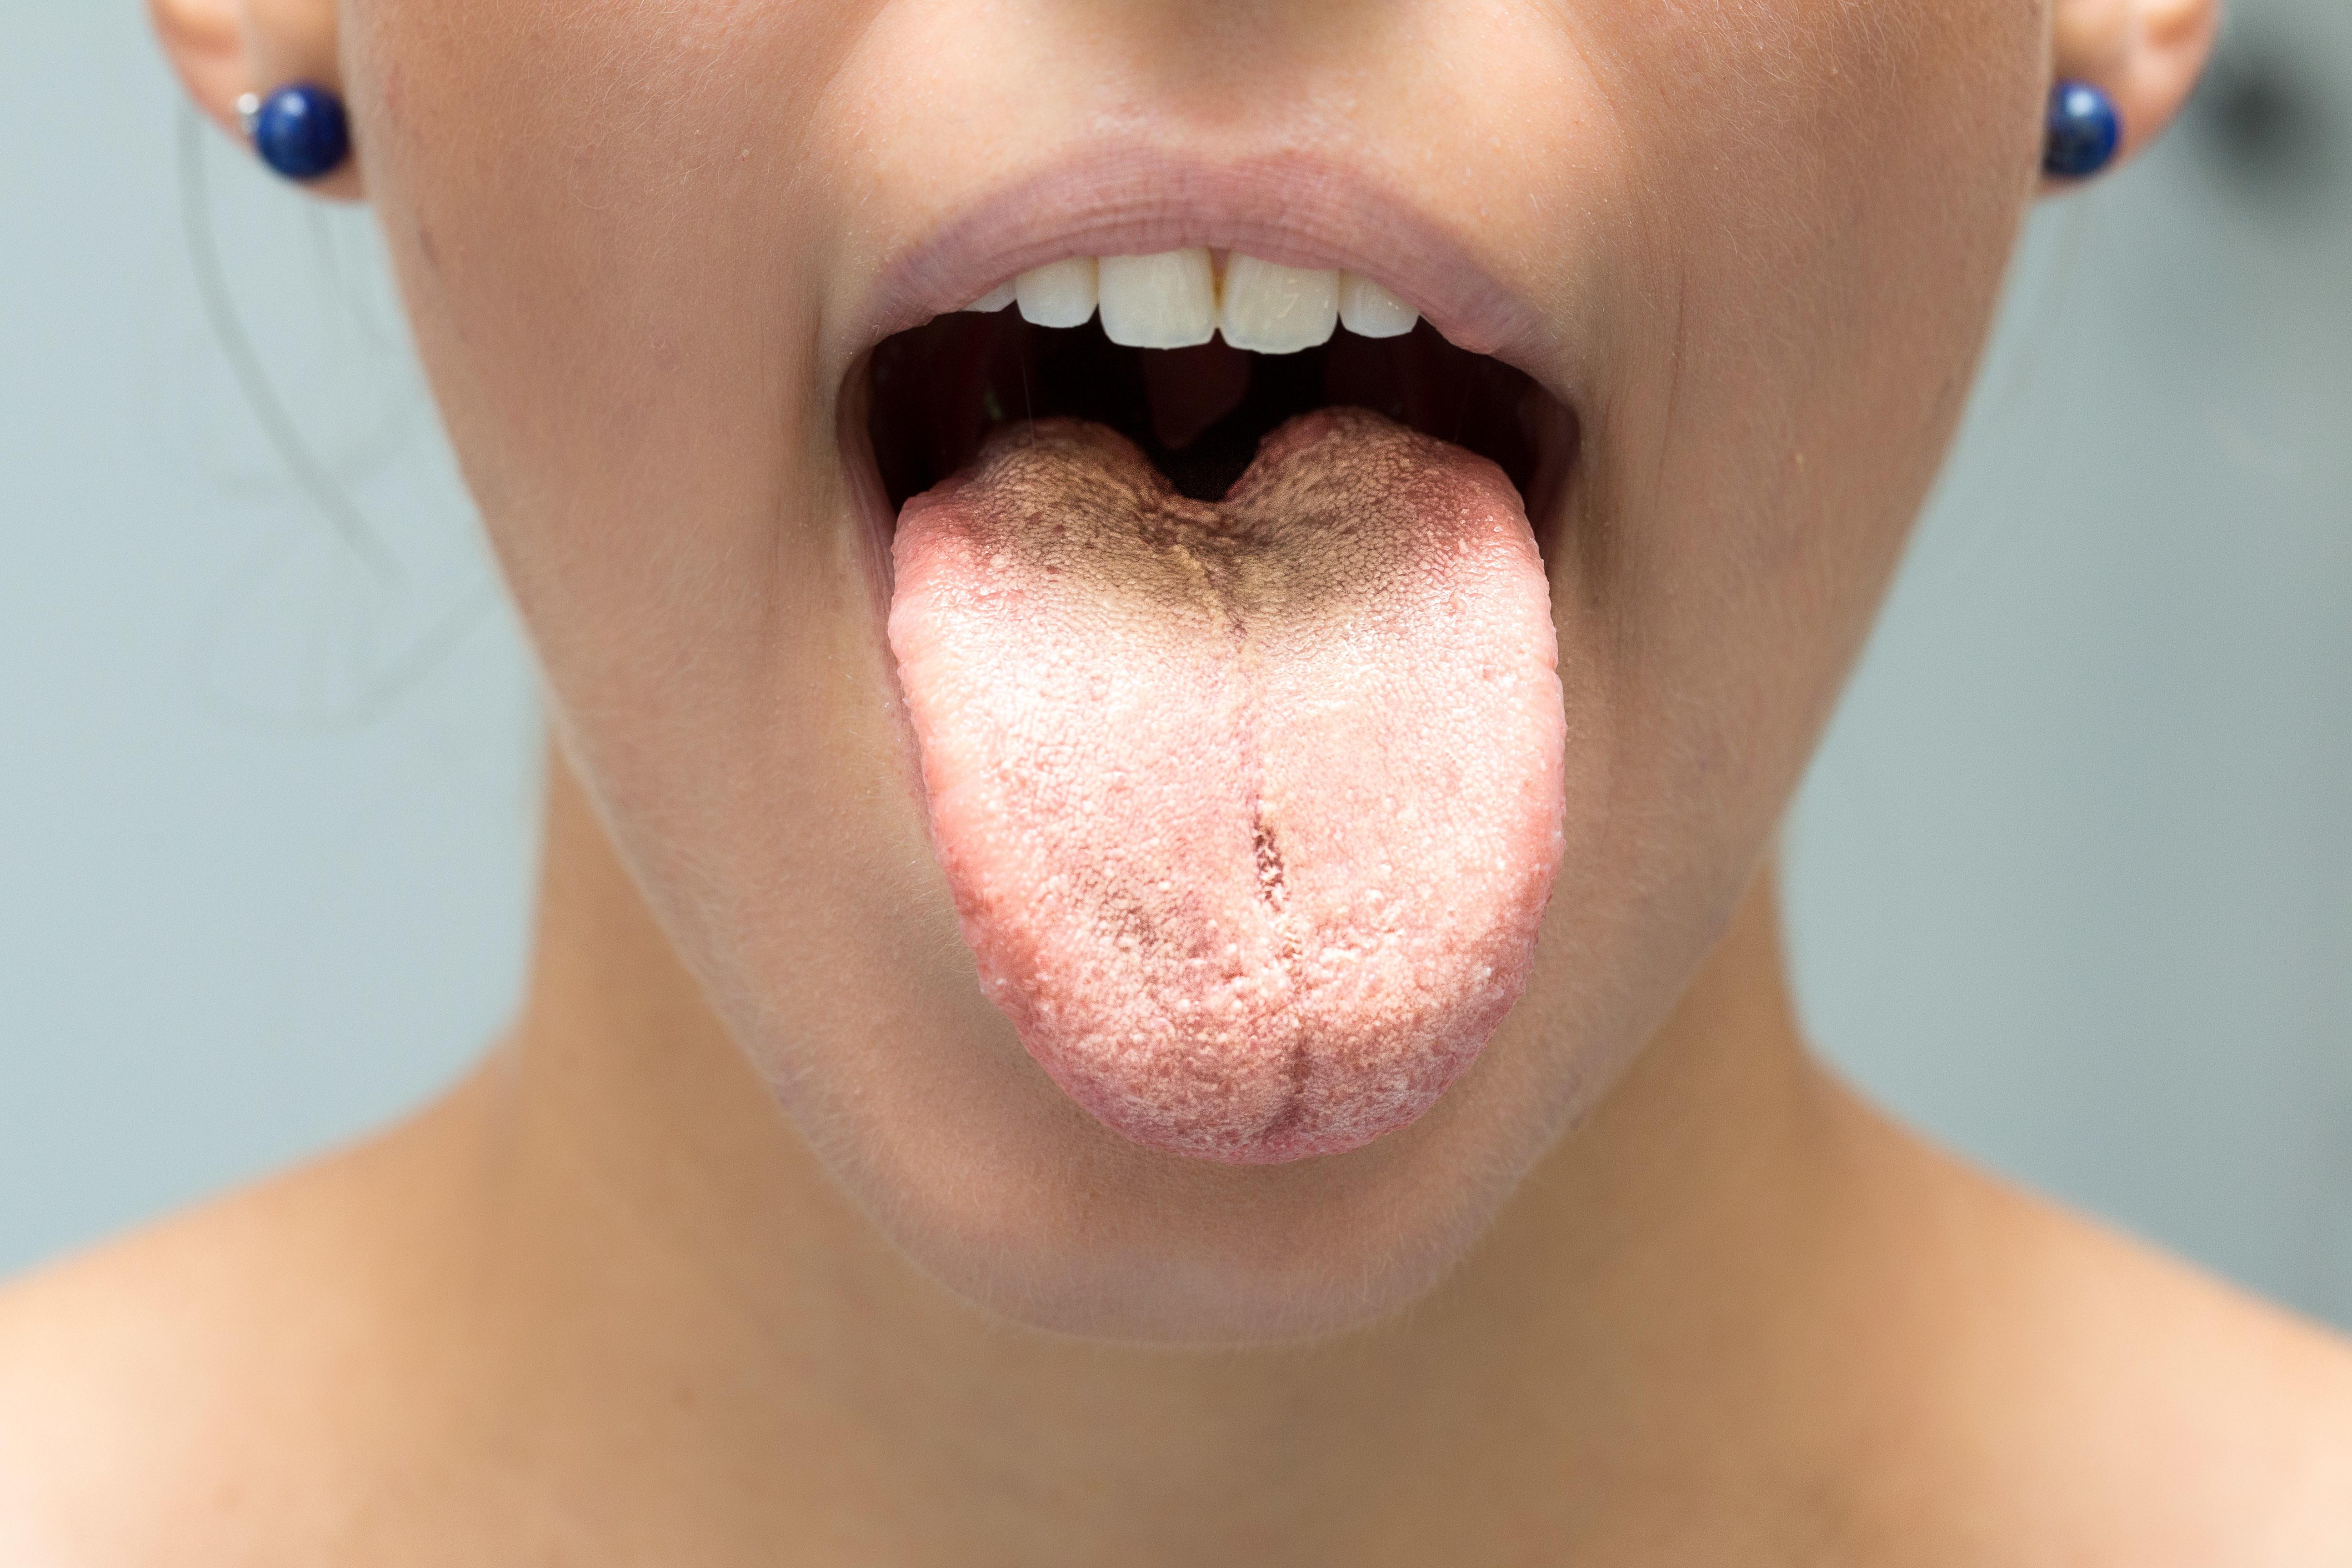 Candida svamp i munden